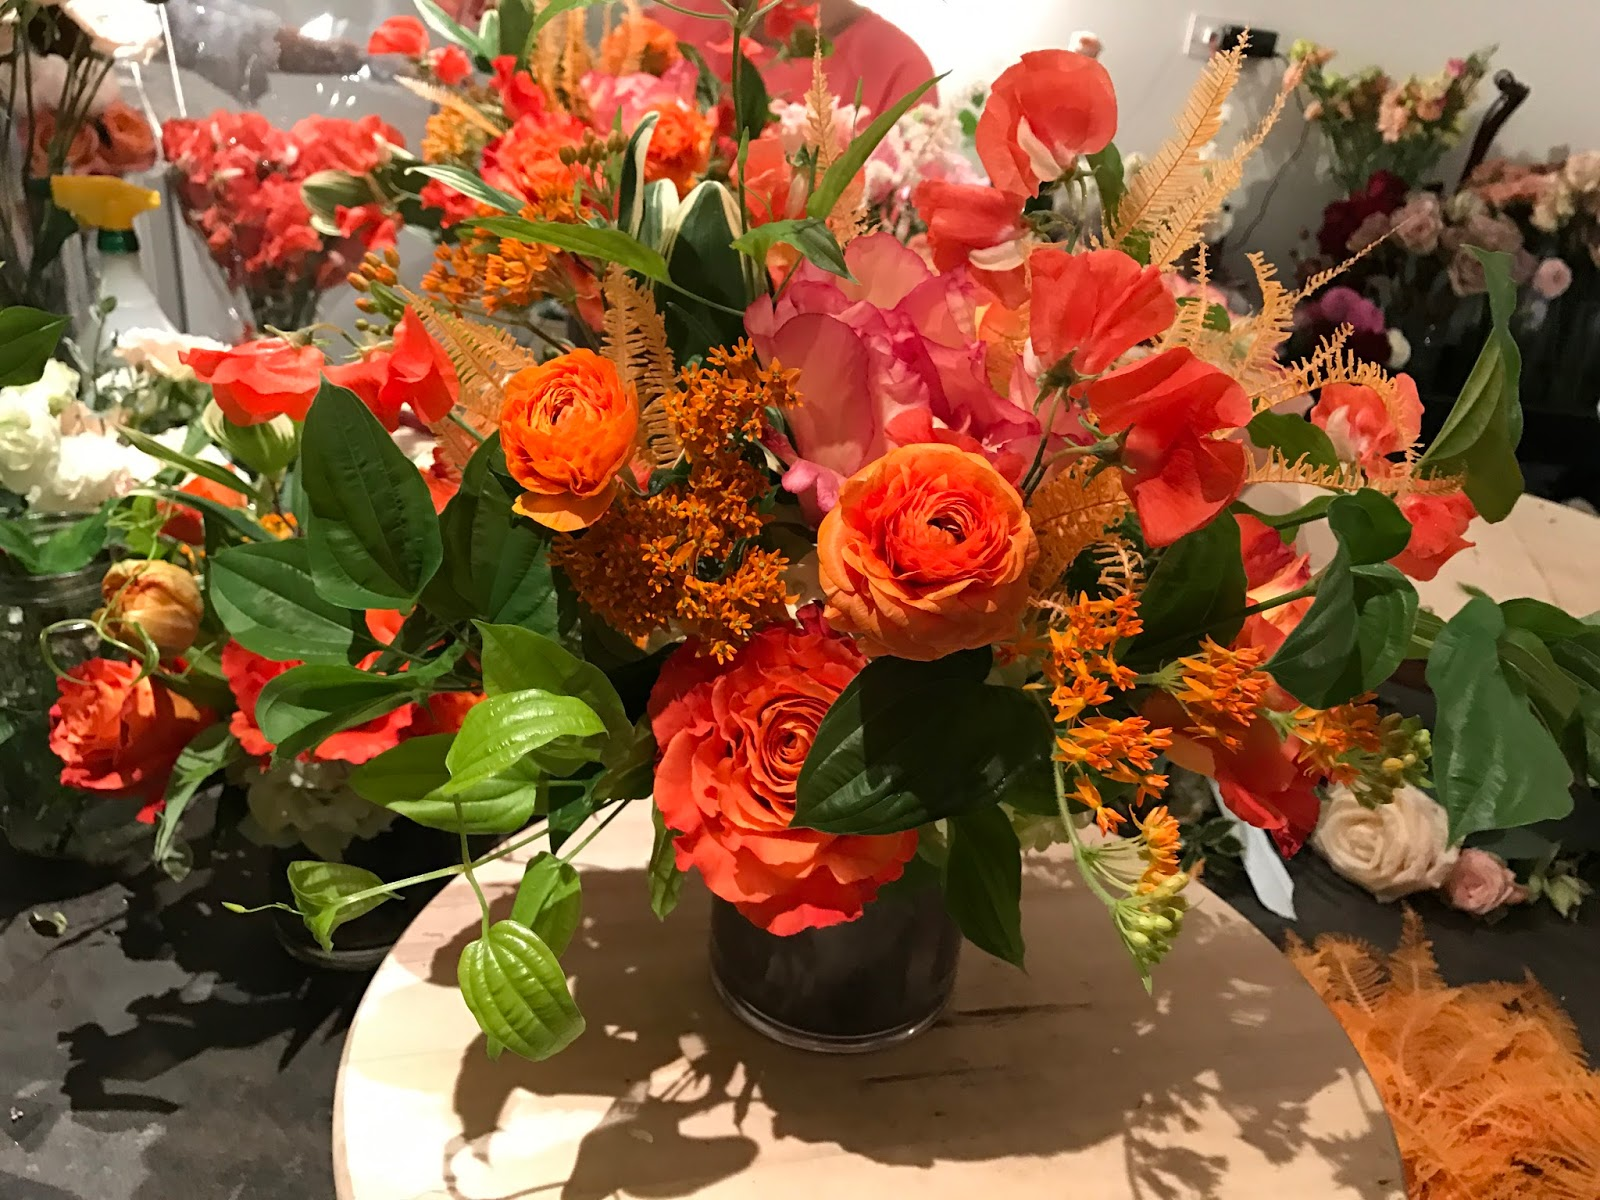 Wedding Event Flower Arrangements in NYC